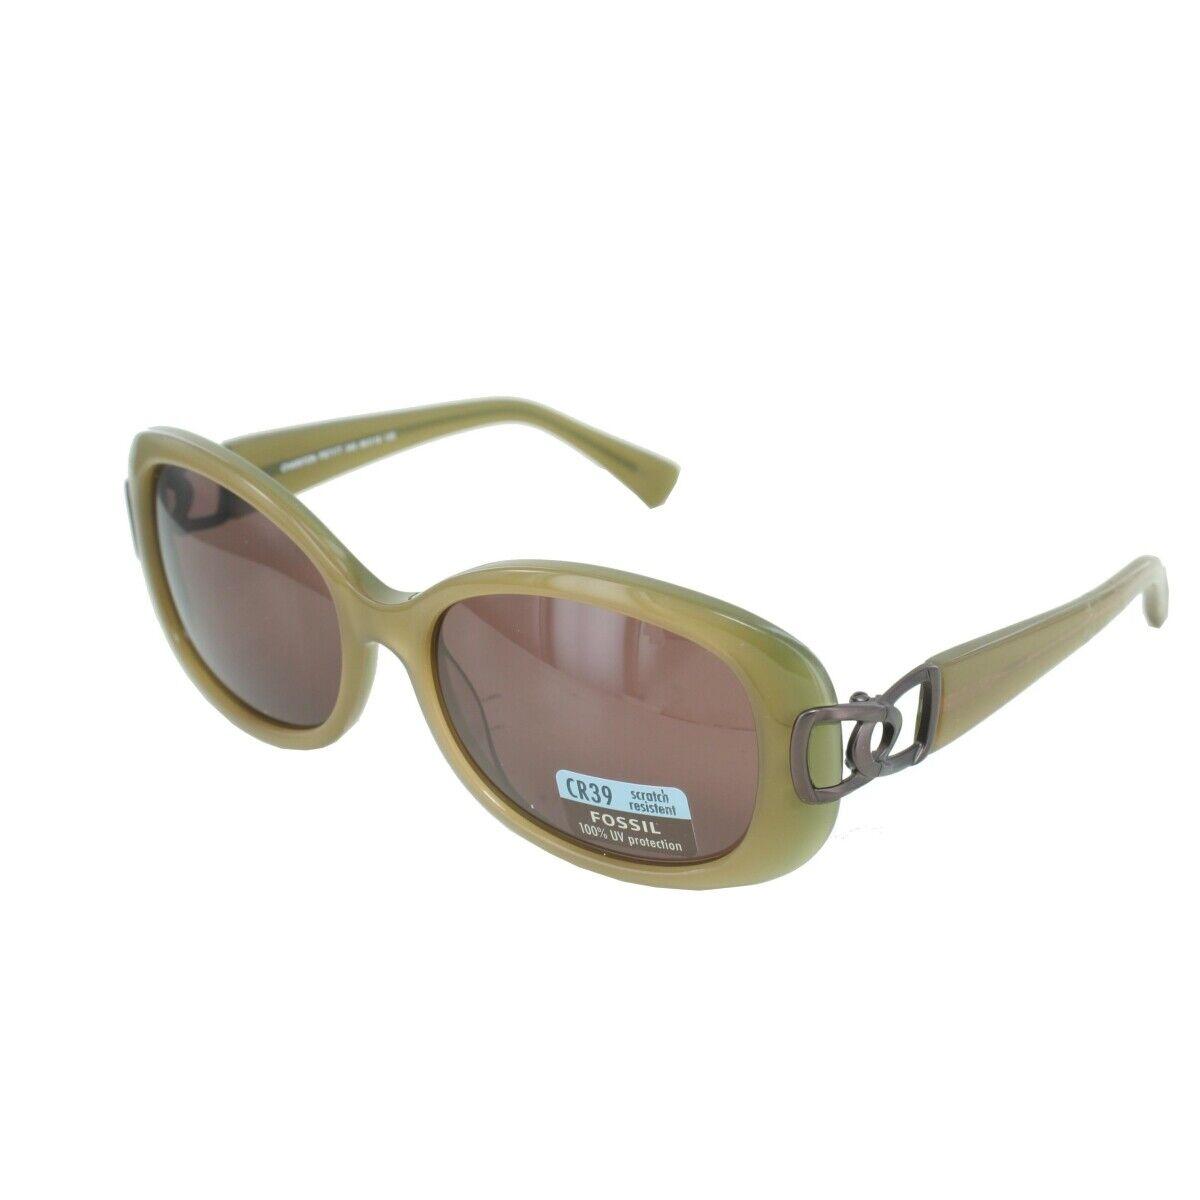 Fossil Sunglasses Chariton Olive PS7177345